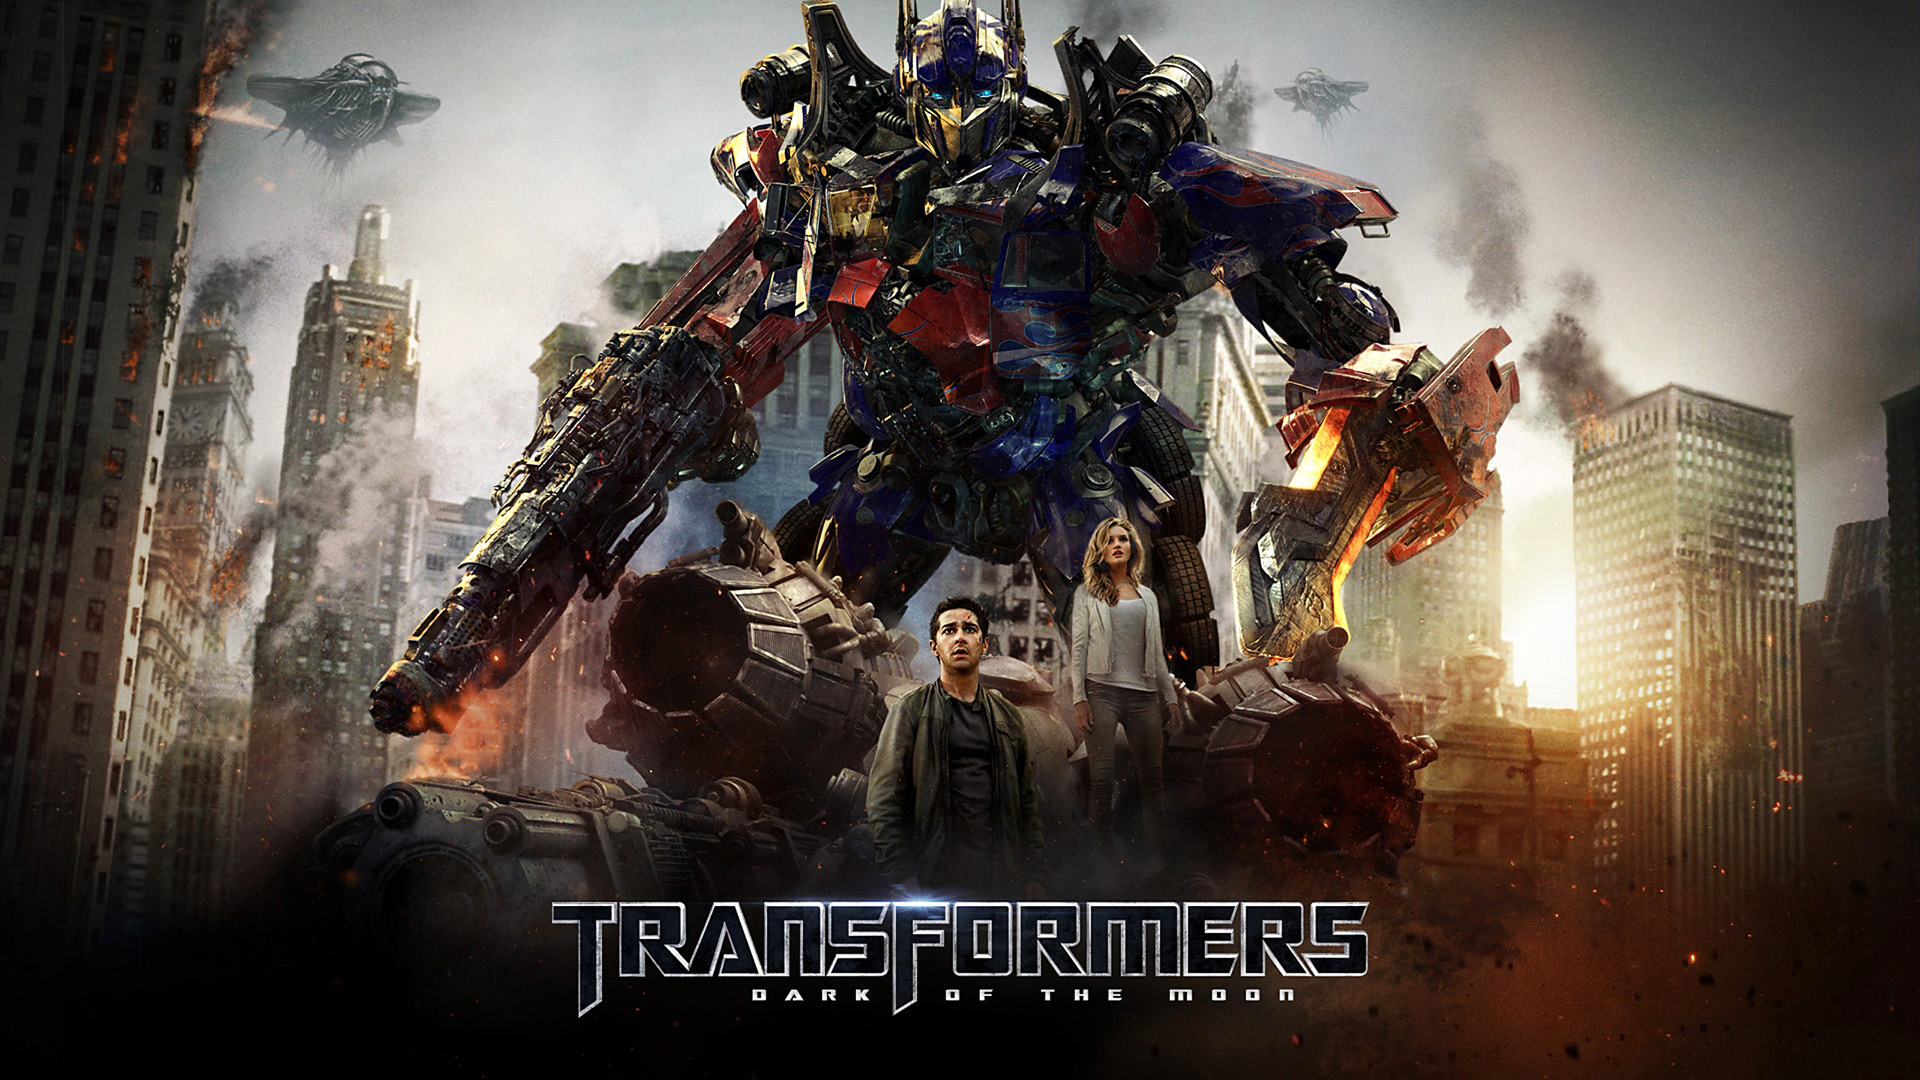 transformers-3-optimus-prime-humans-1920x1080.jpg